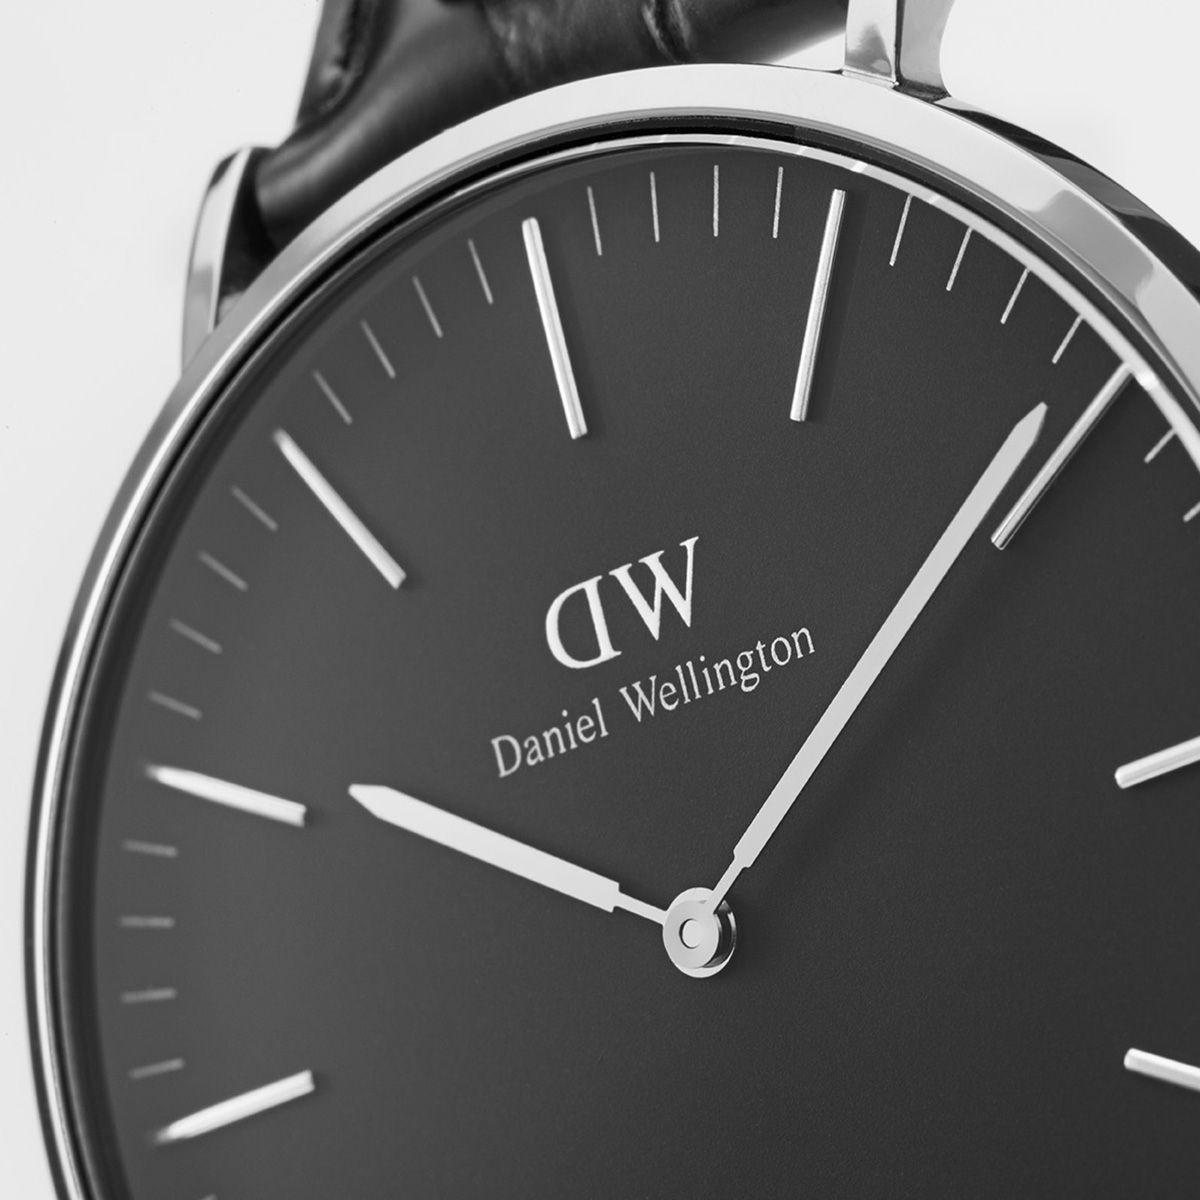 dw官网 dw手表官网 dw中国官网 dw官方旗舰店 DW DW官网  W Classic Black Bayswater Silver 40mm